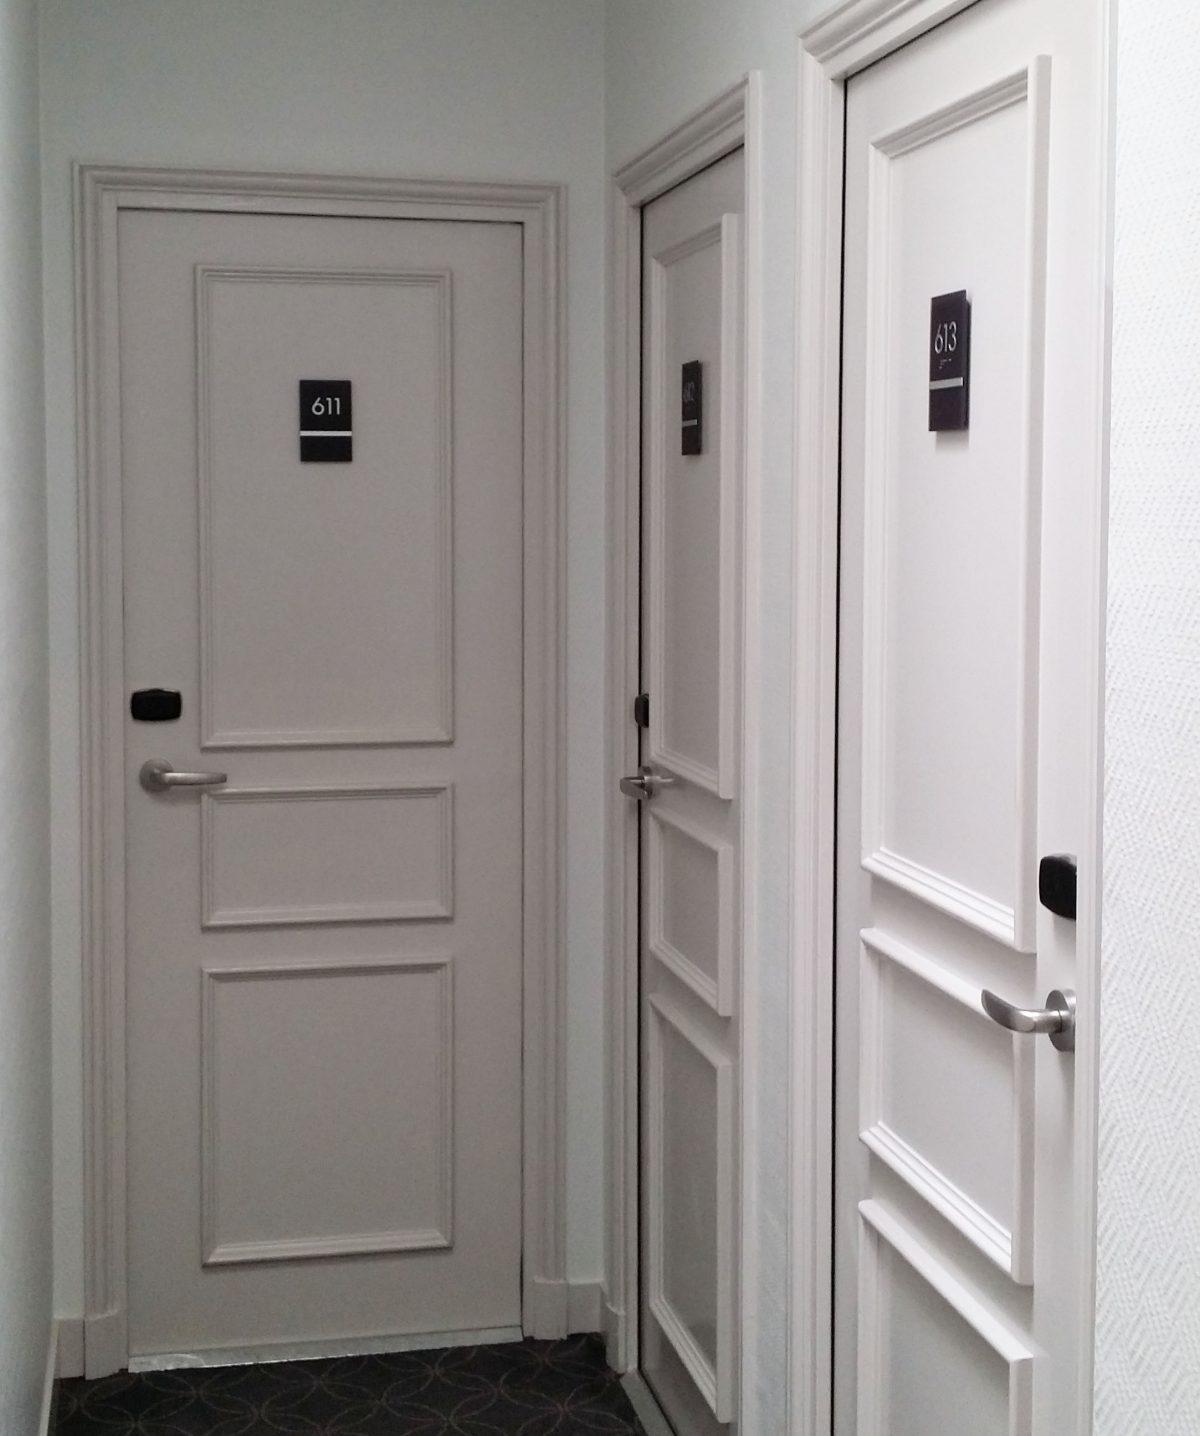 signaletique-hotel-collection-santo-4